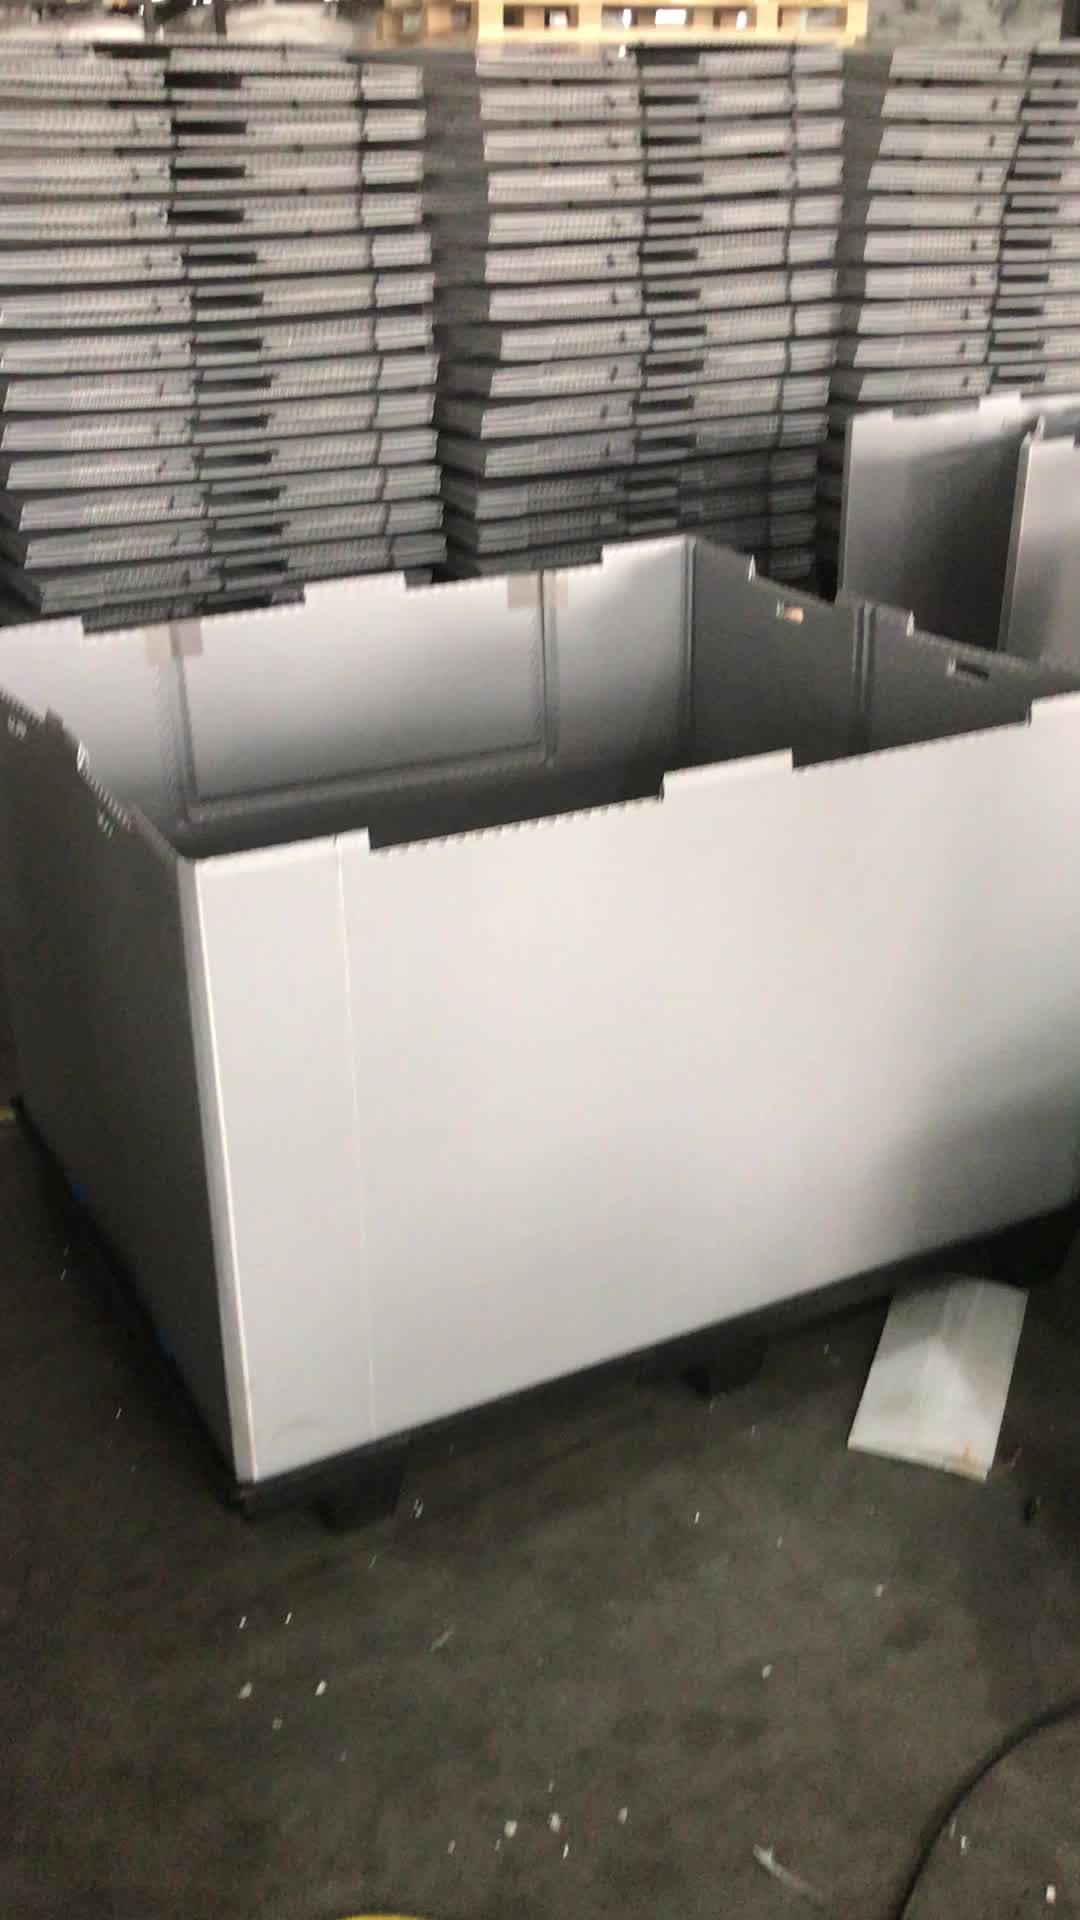 बंधनेवाला प्लास्टिक की चटाई पैक बॉक्स